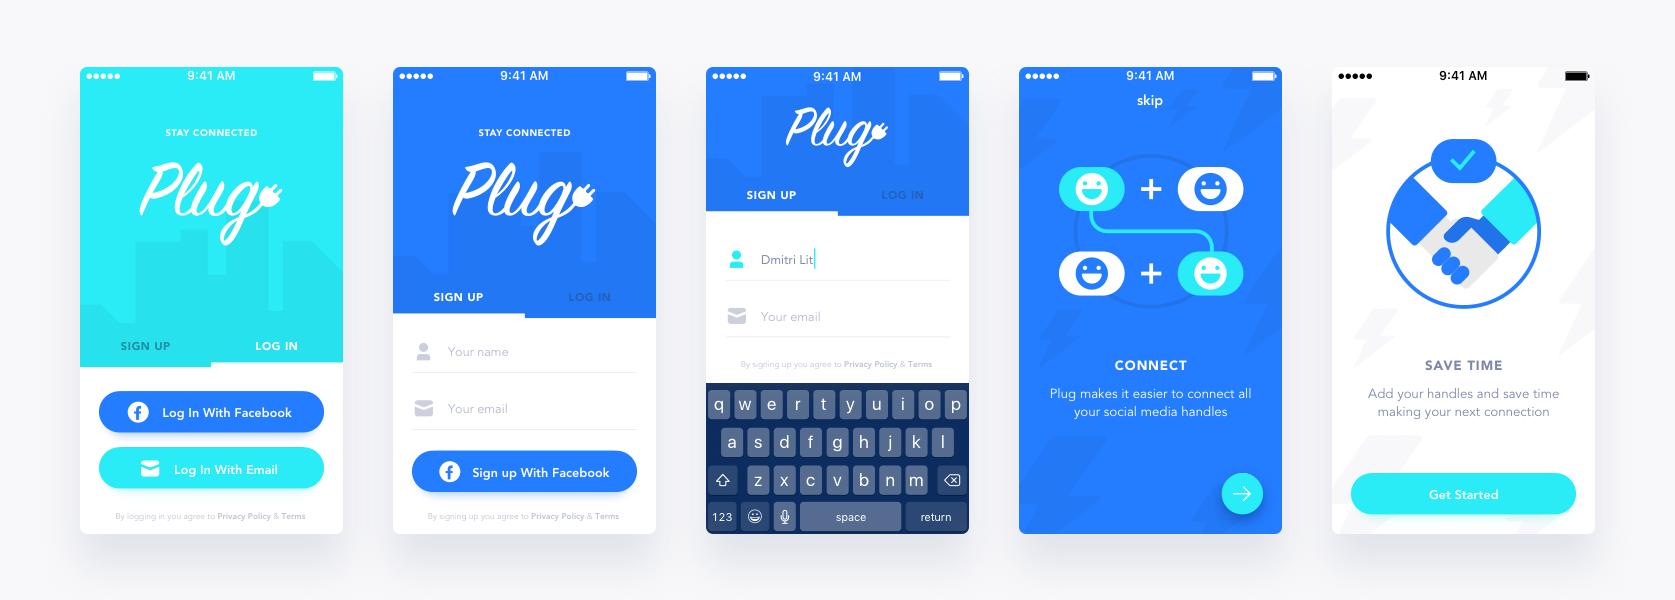 Plug onboarding screens Onboarding, Litvinov, Restaurant app